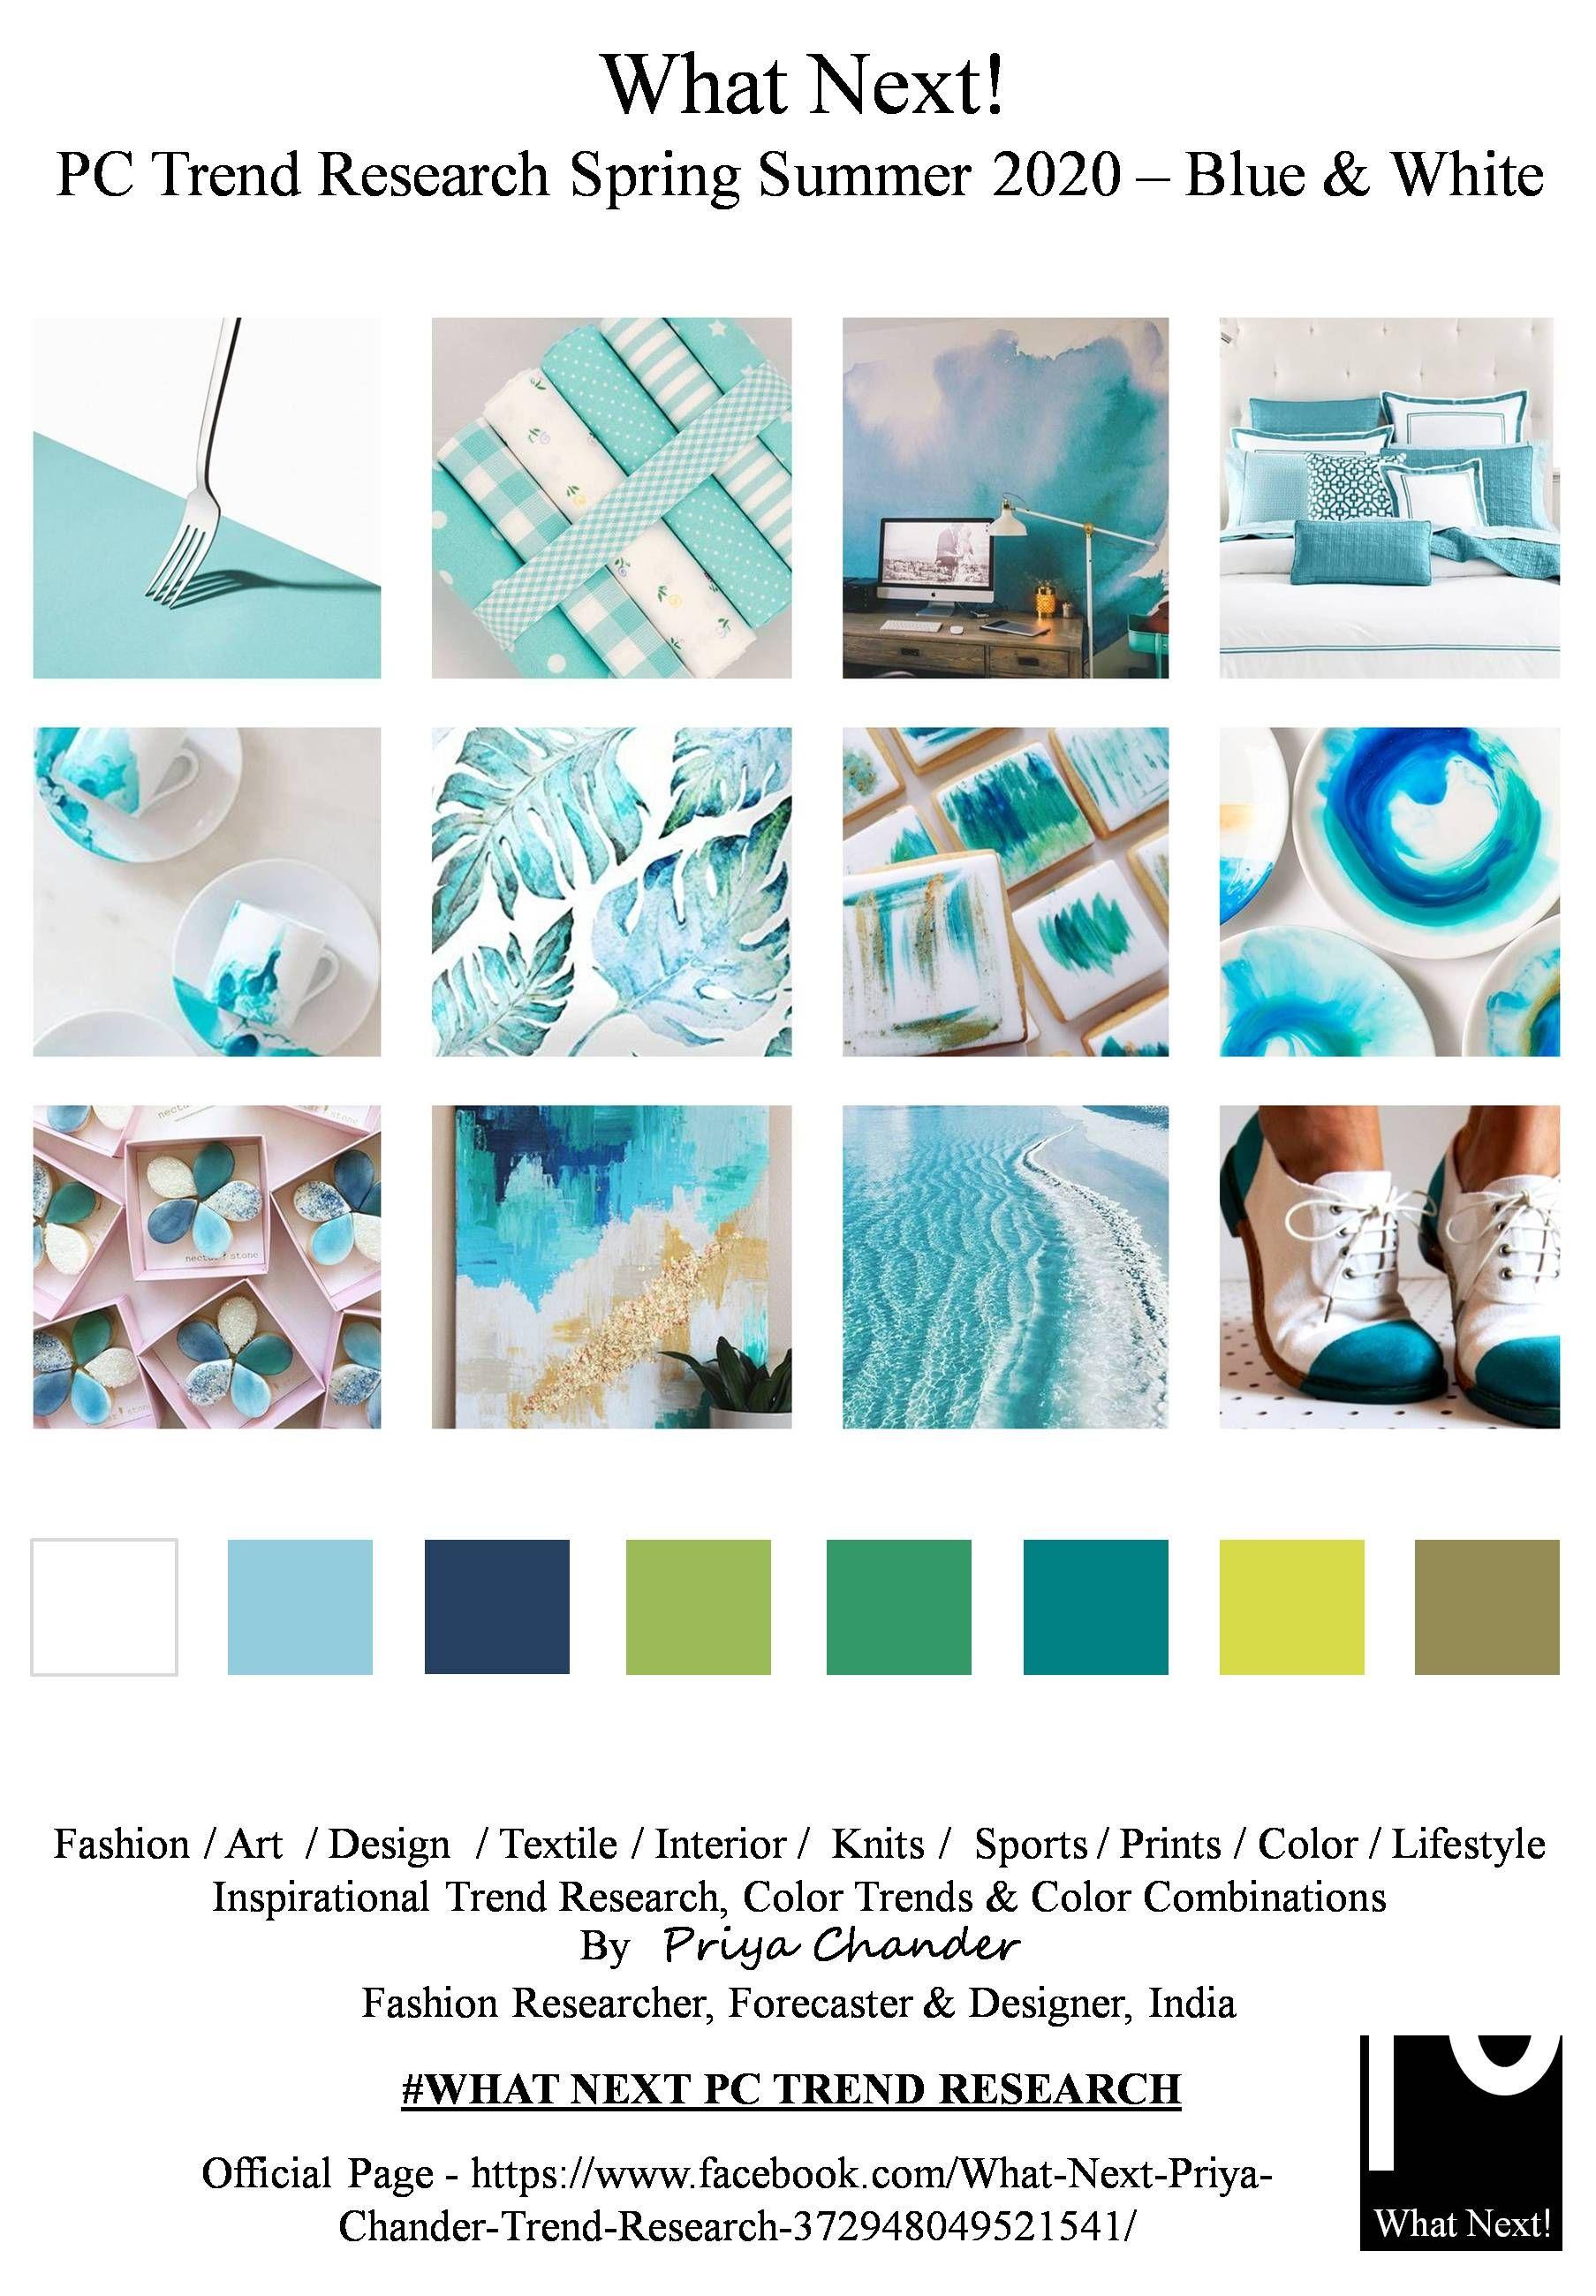 #Fashion #blue #bluecolor #blueandwhite #fashionprints # ...